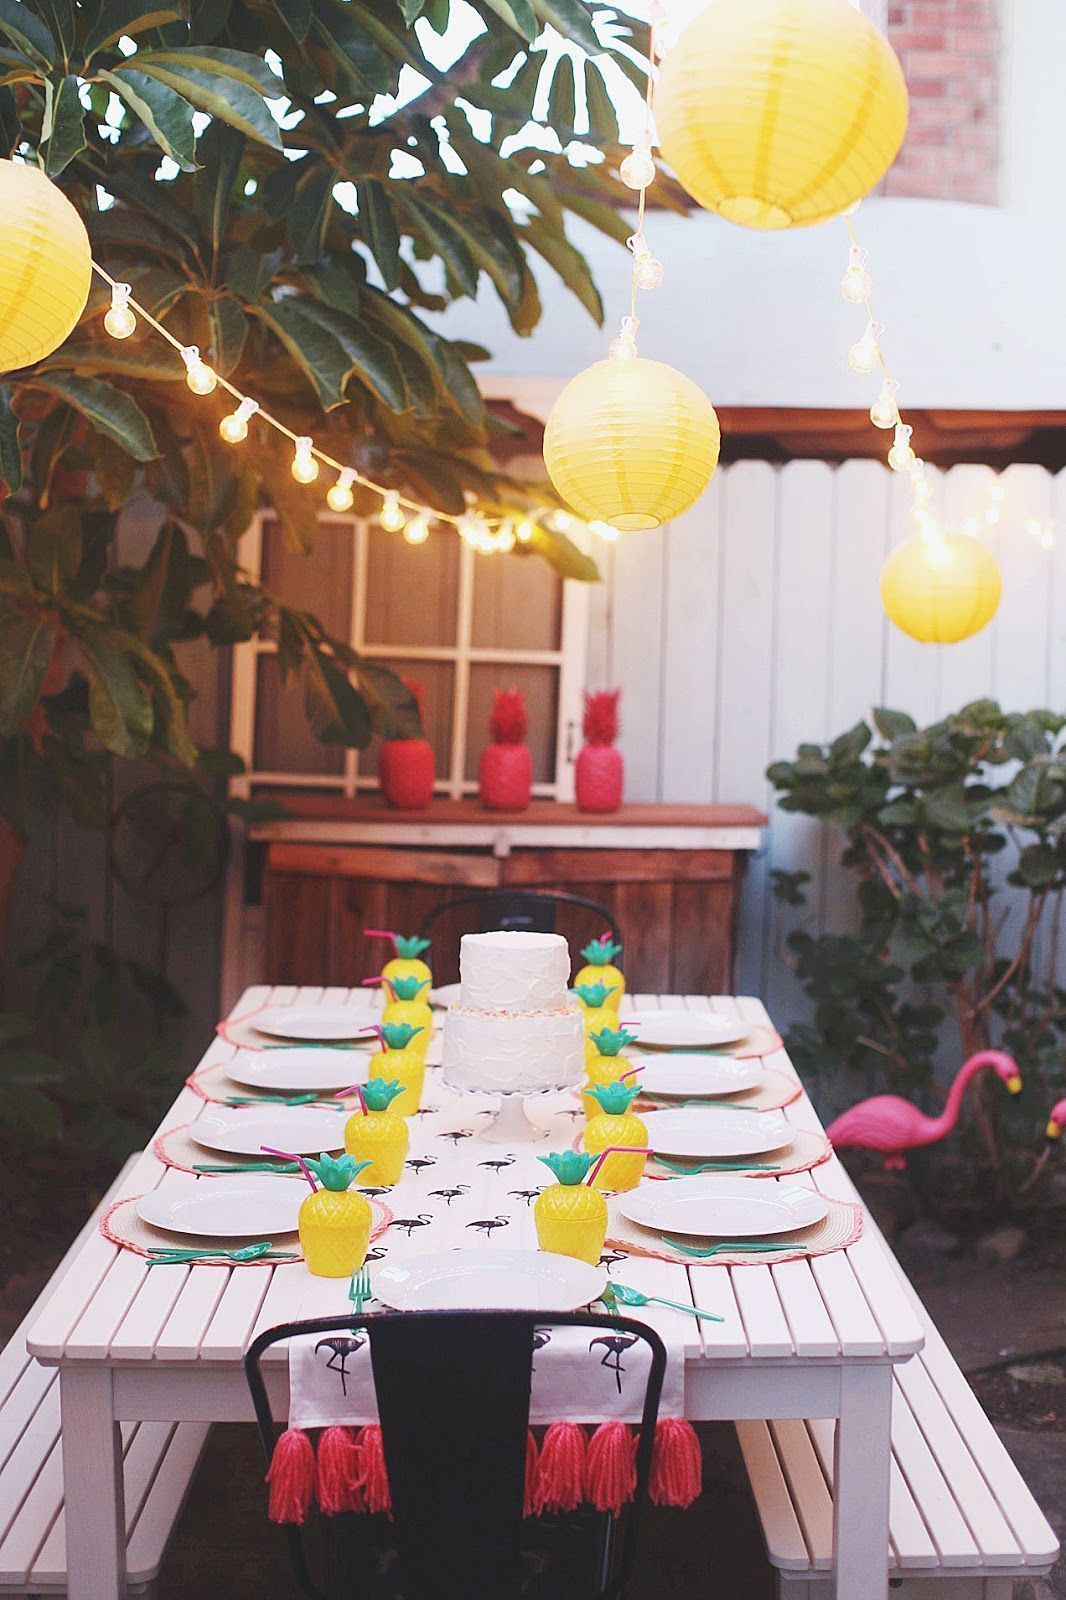 Foto: Reprodução / Tell love and party